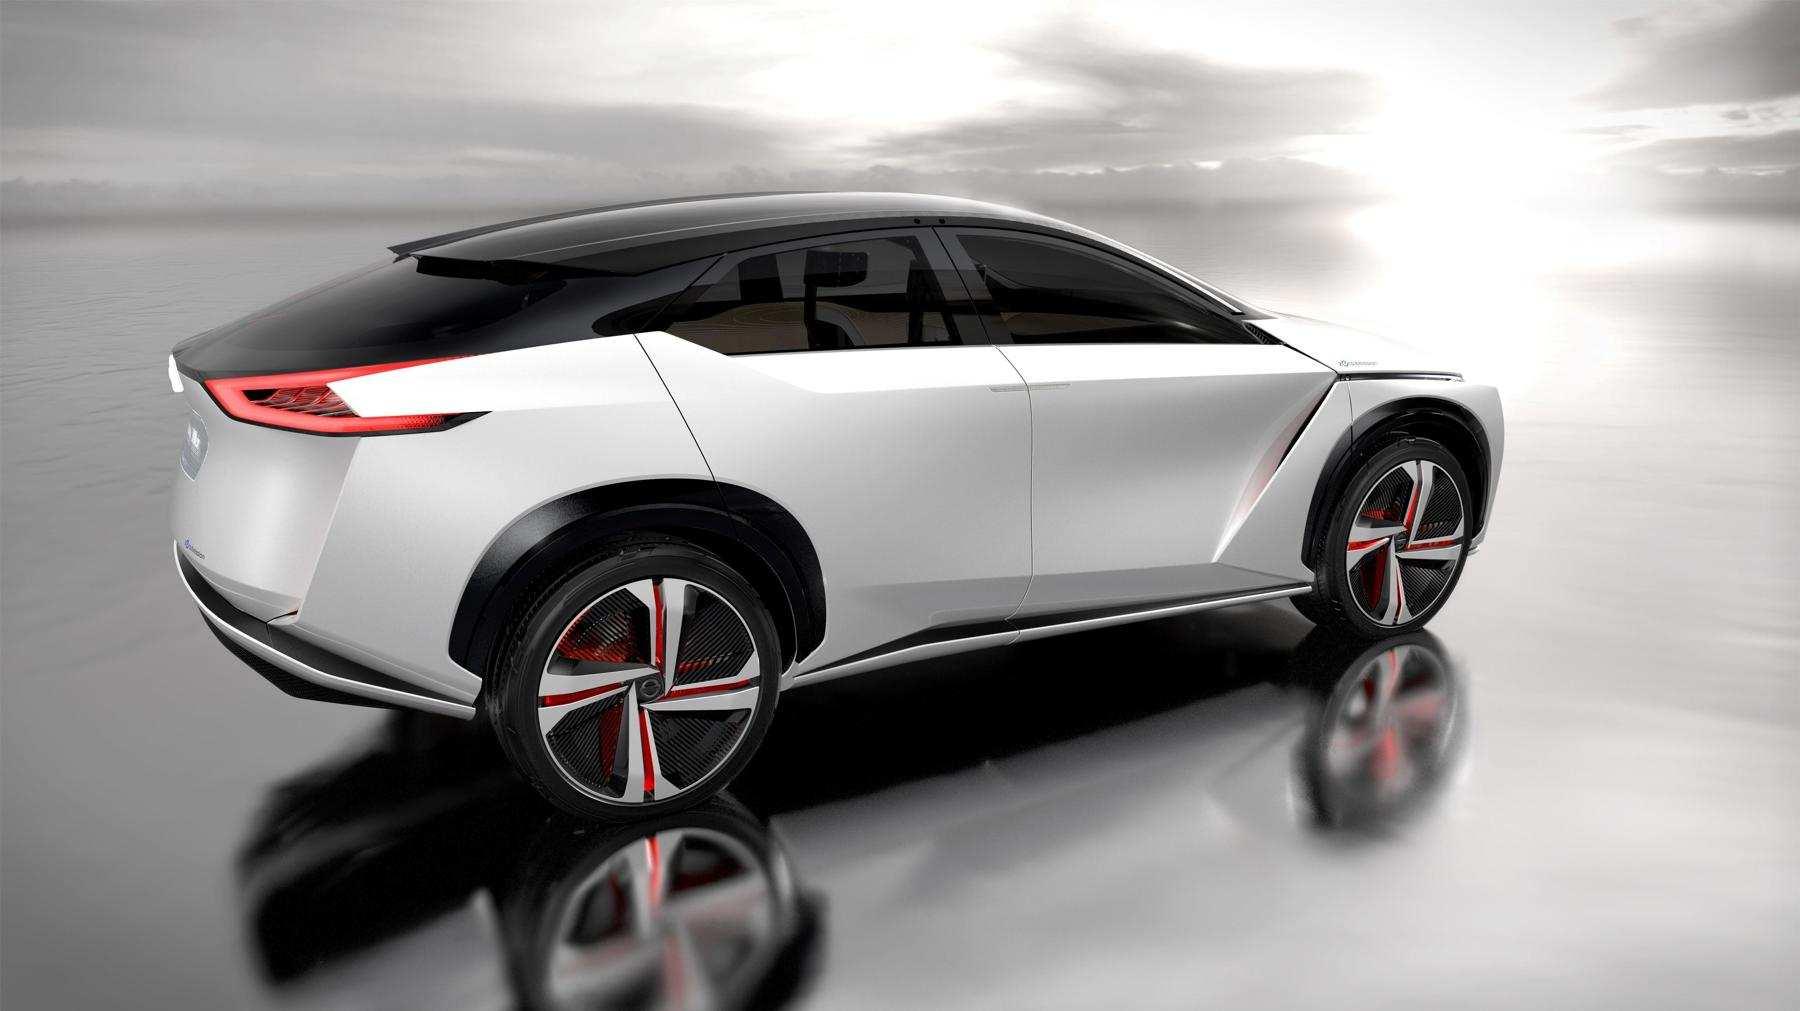 27 New Mitsubishi Electric Vehicle 2020 Research New with Mitsubishi Electric Vehicle 2020